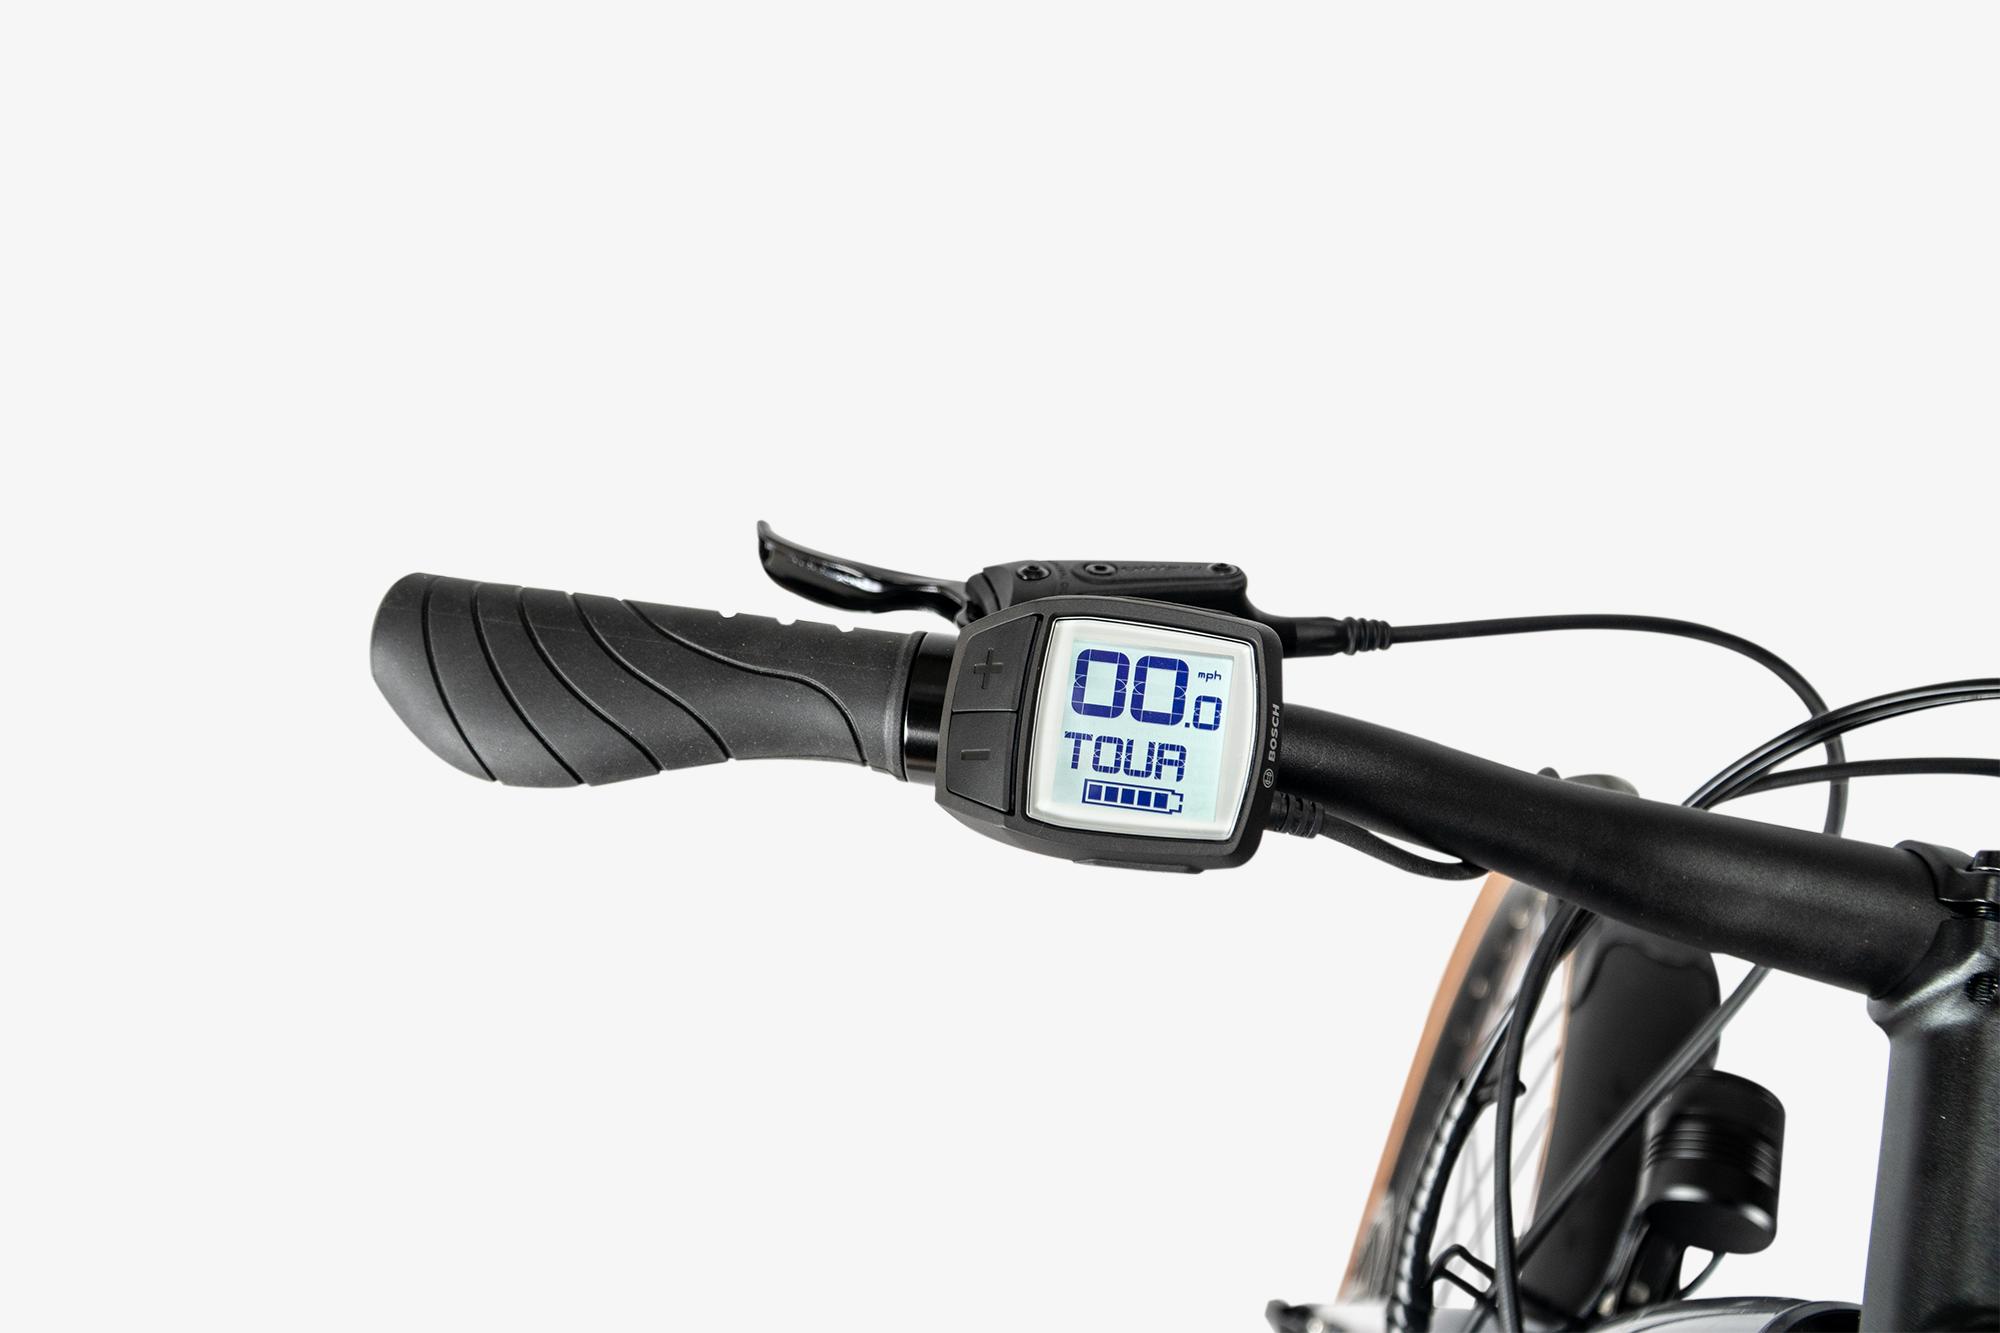 Bosch display on the Priority Embark electric bike